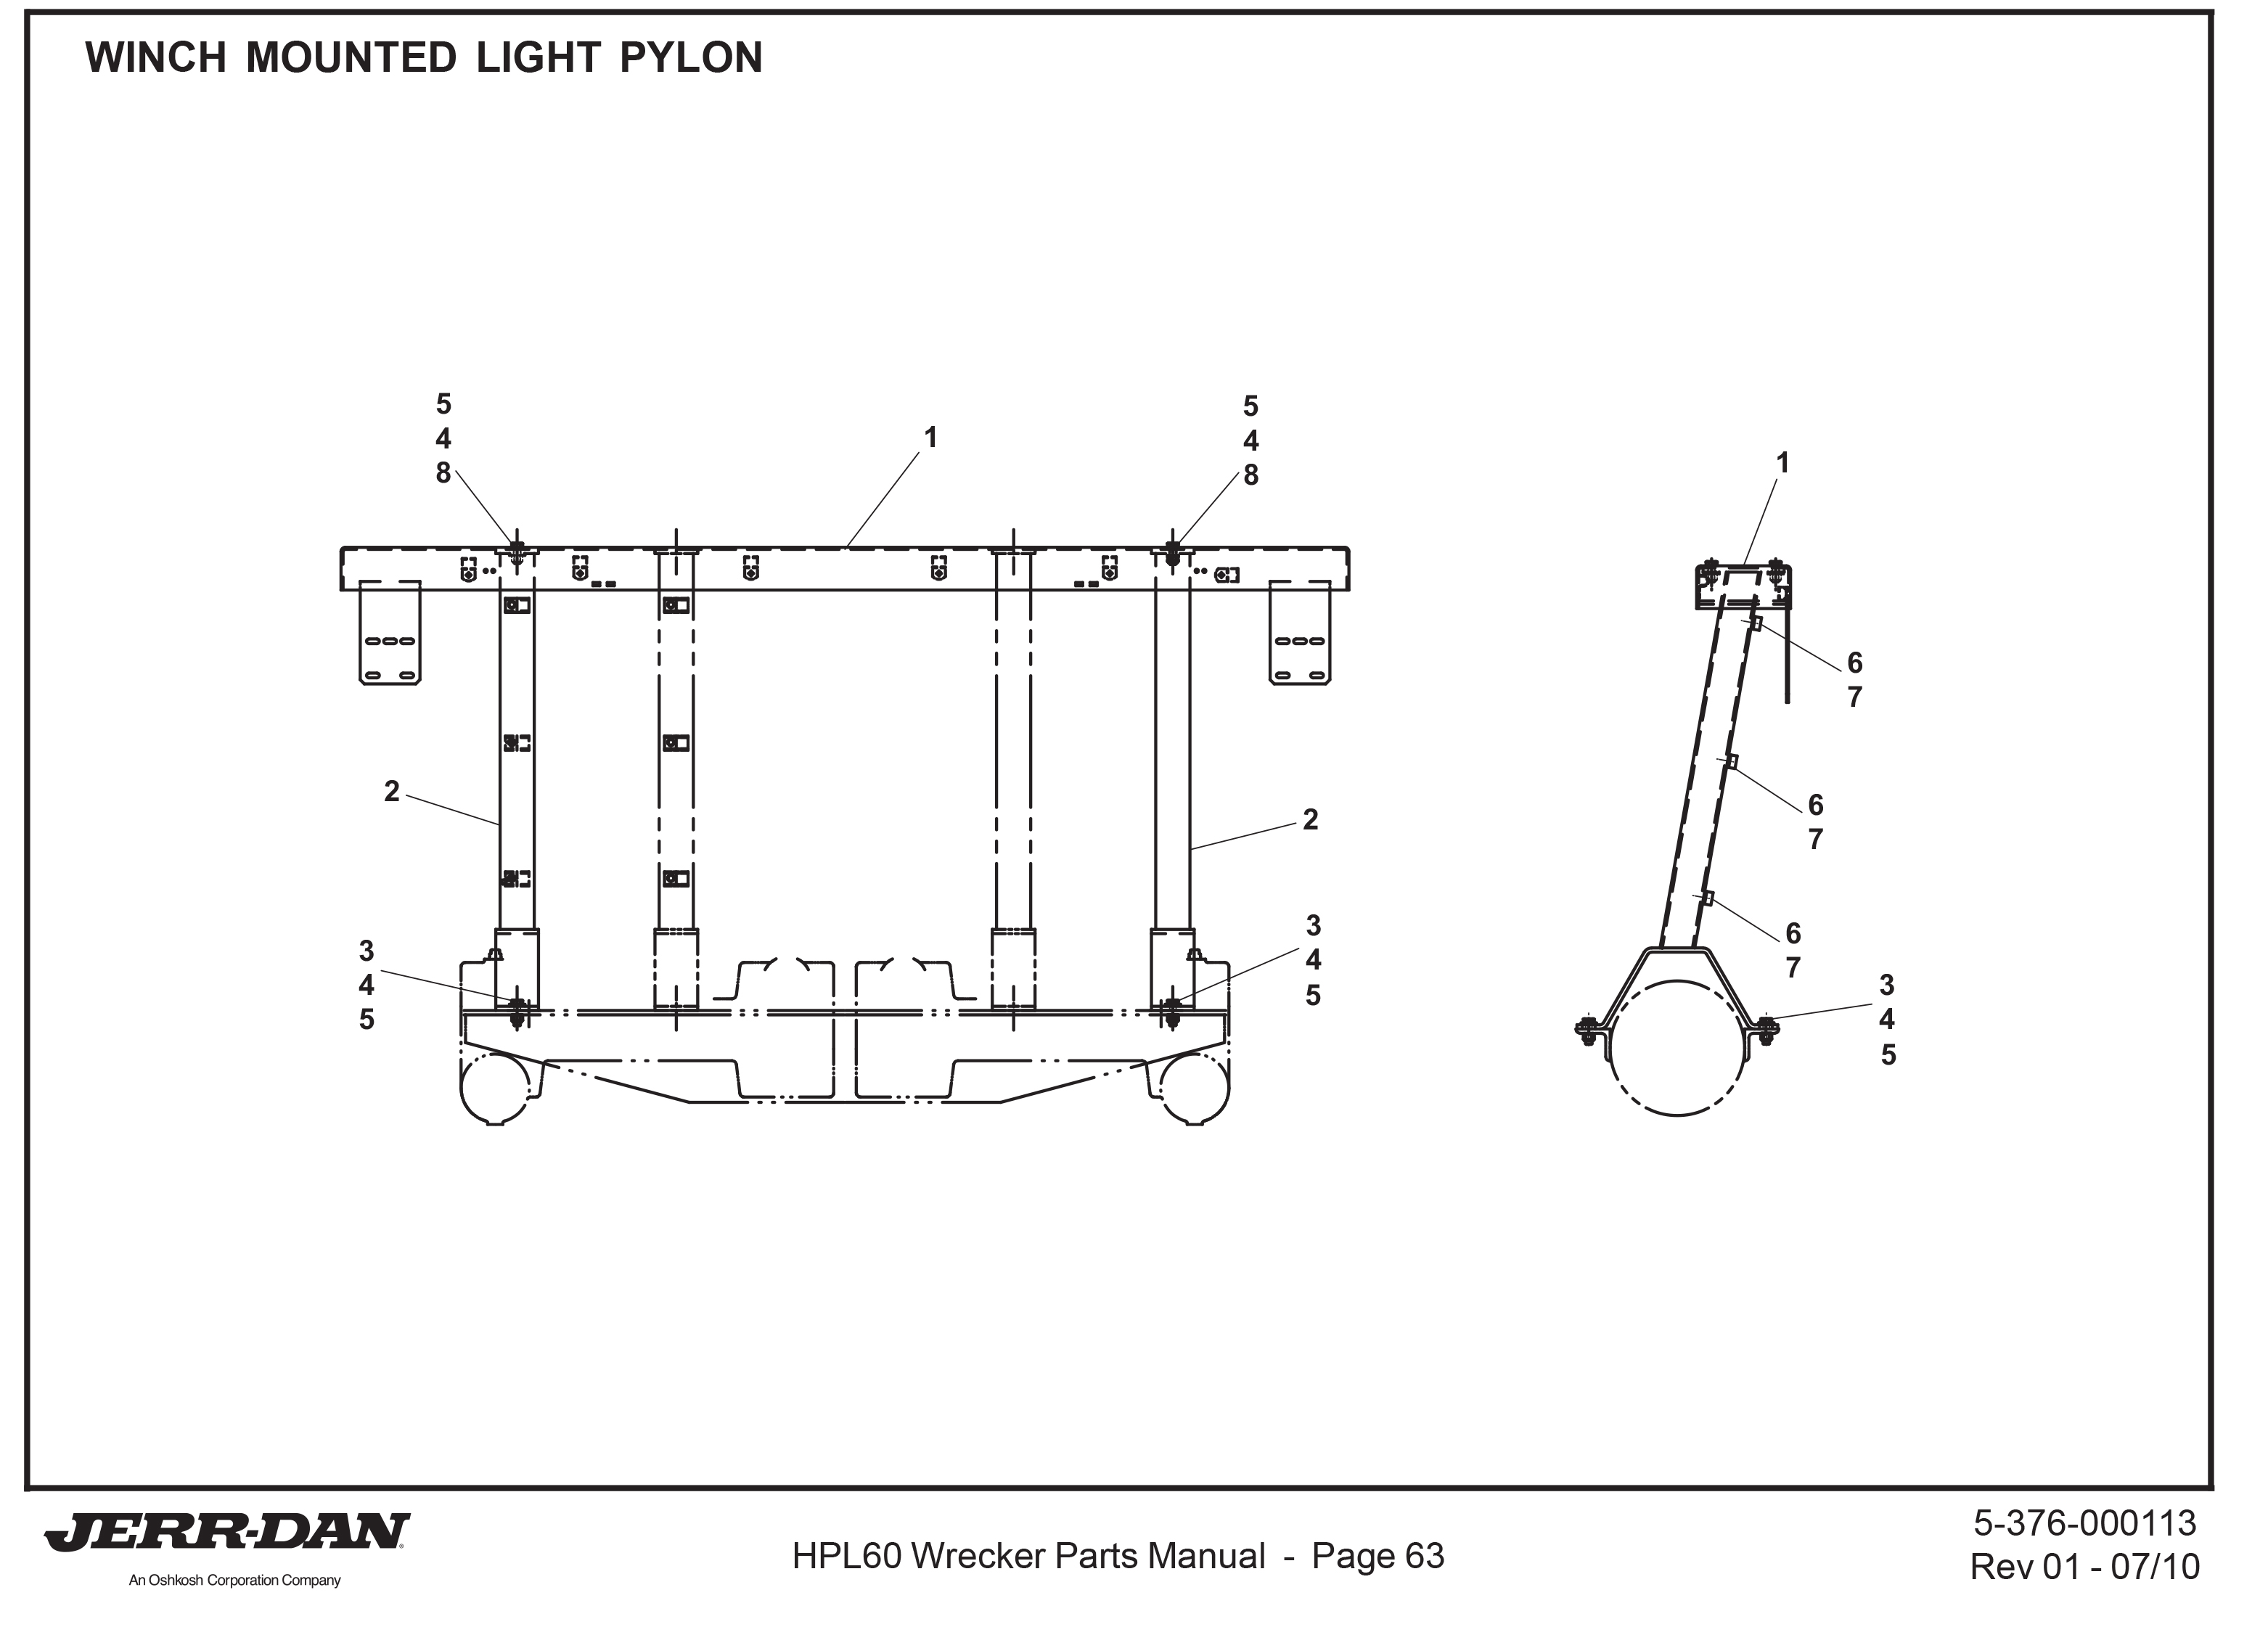 7 pole trailer wiring diagram 4 wire 220 volt kaufman circuit maker